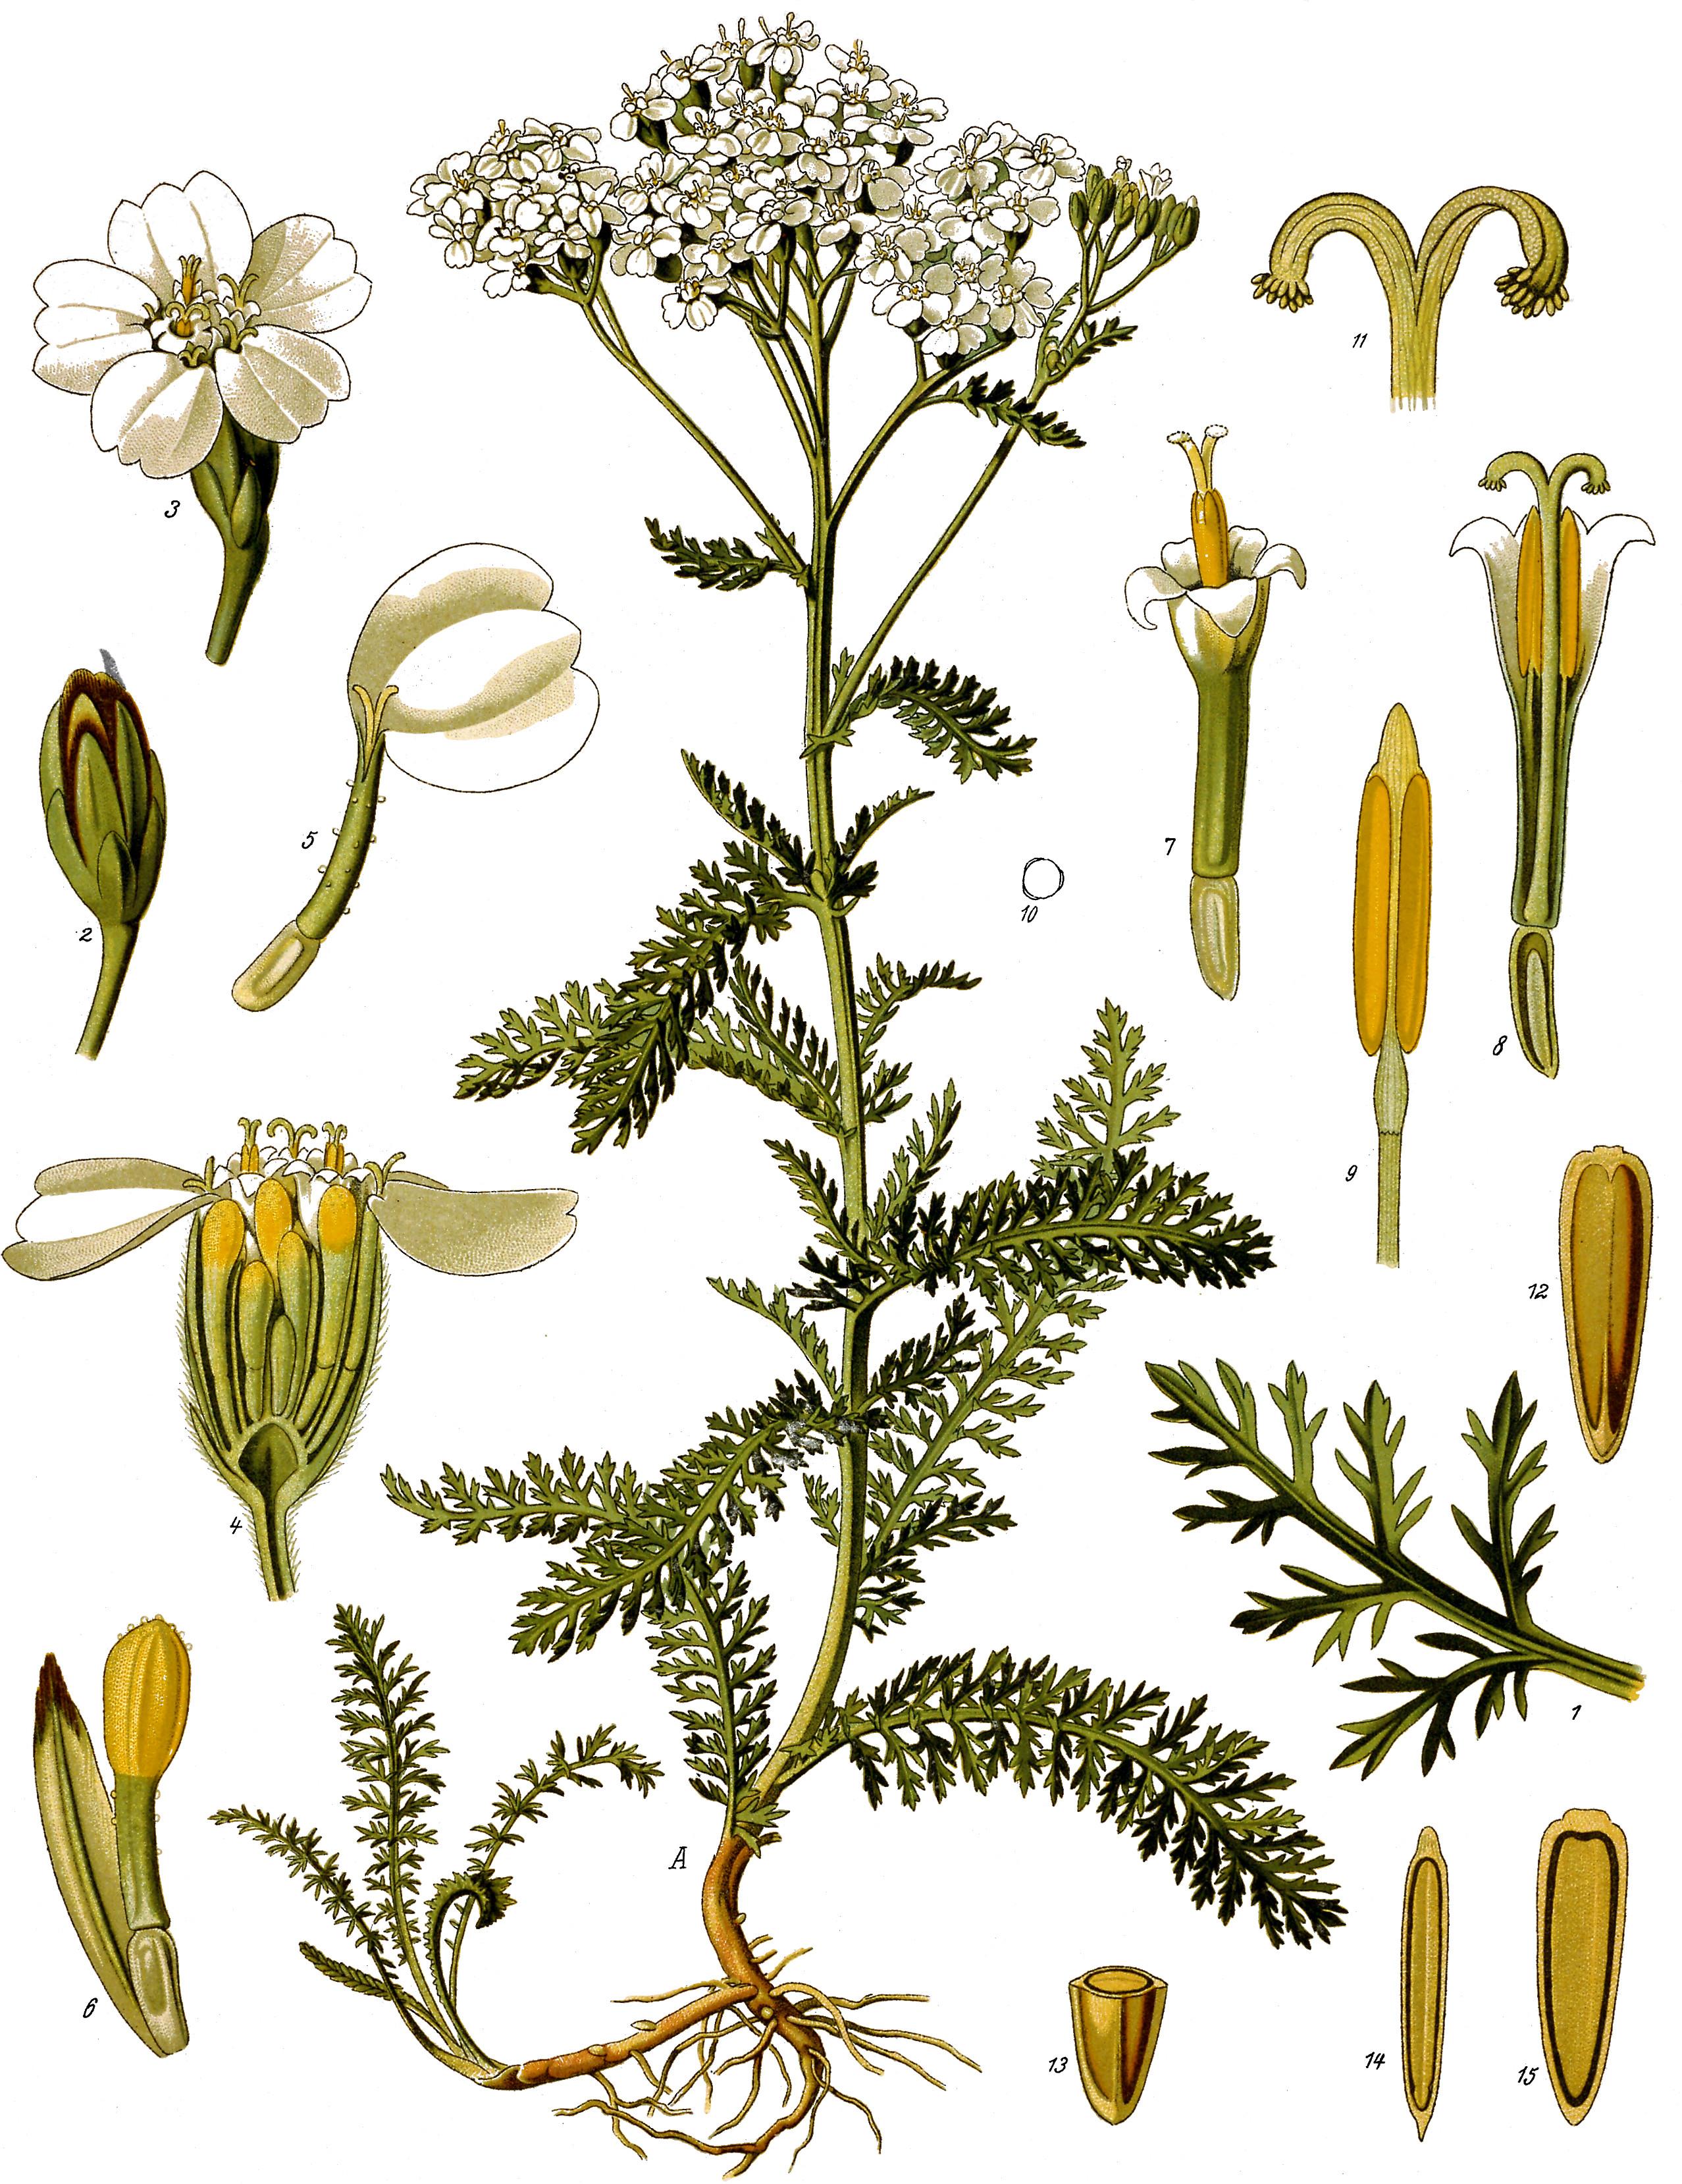 http://upload.wikimedia.org/wikipedia/commons/4/41/Achillea_millefolium_-_K%C3%B6hler%E2%80%93s_Medizinal-Pflanzen-149.jpg